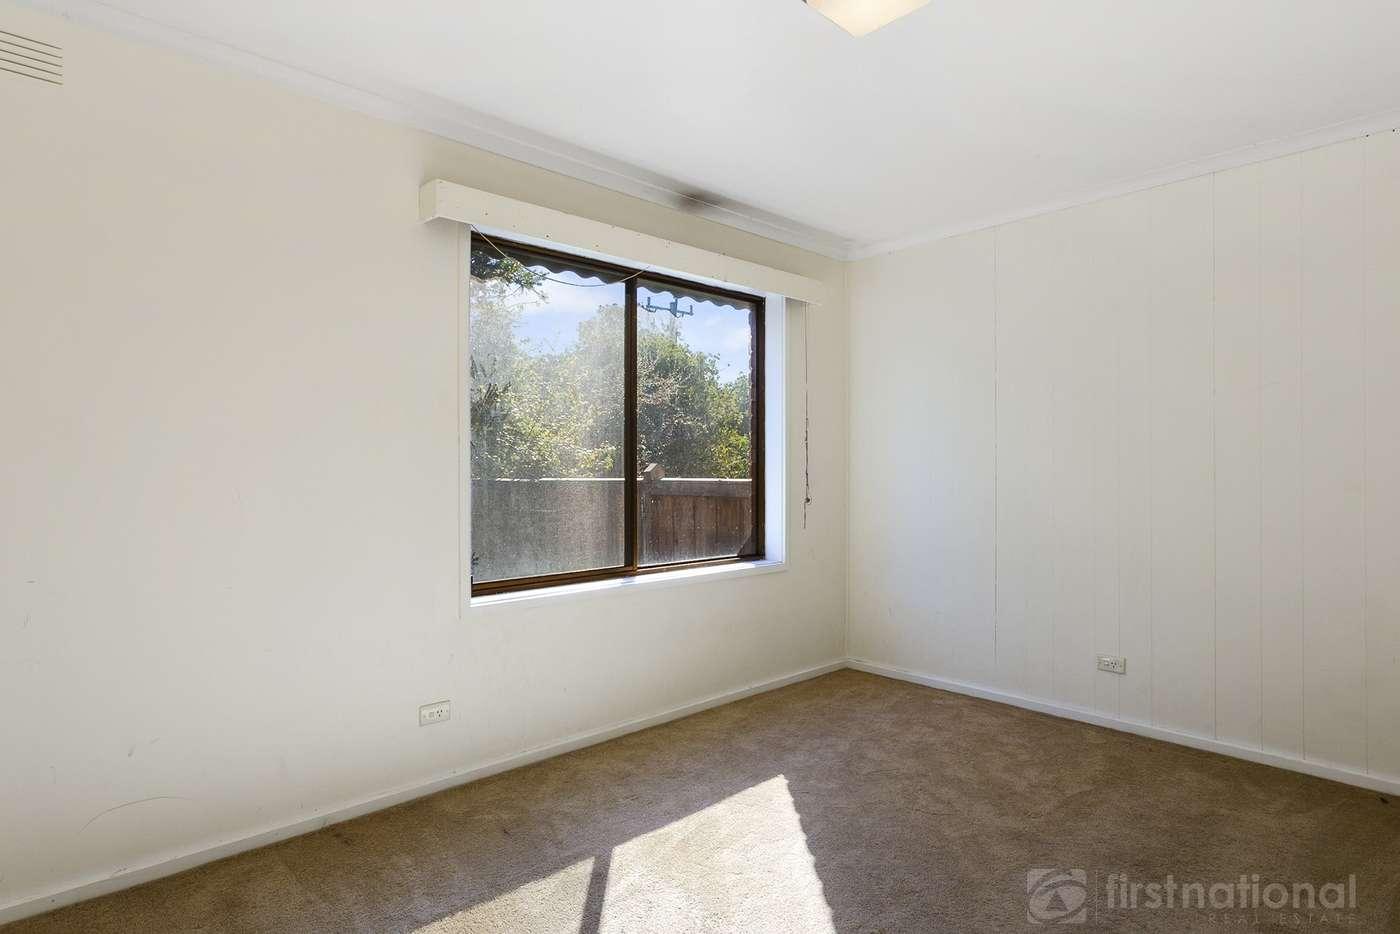 Fifth view of Homely house listing, 29 Santa Barbara Drive, Frankston VIC 3199